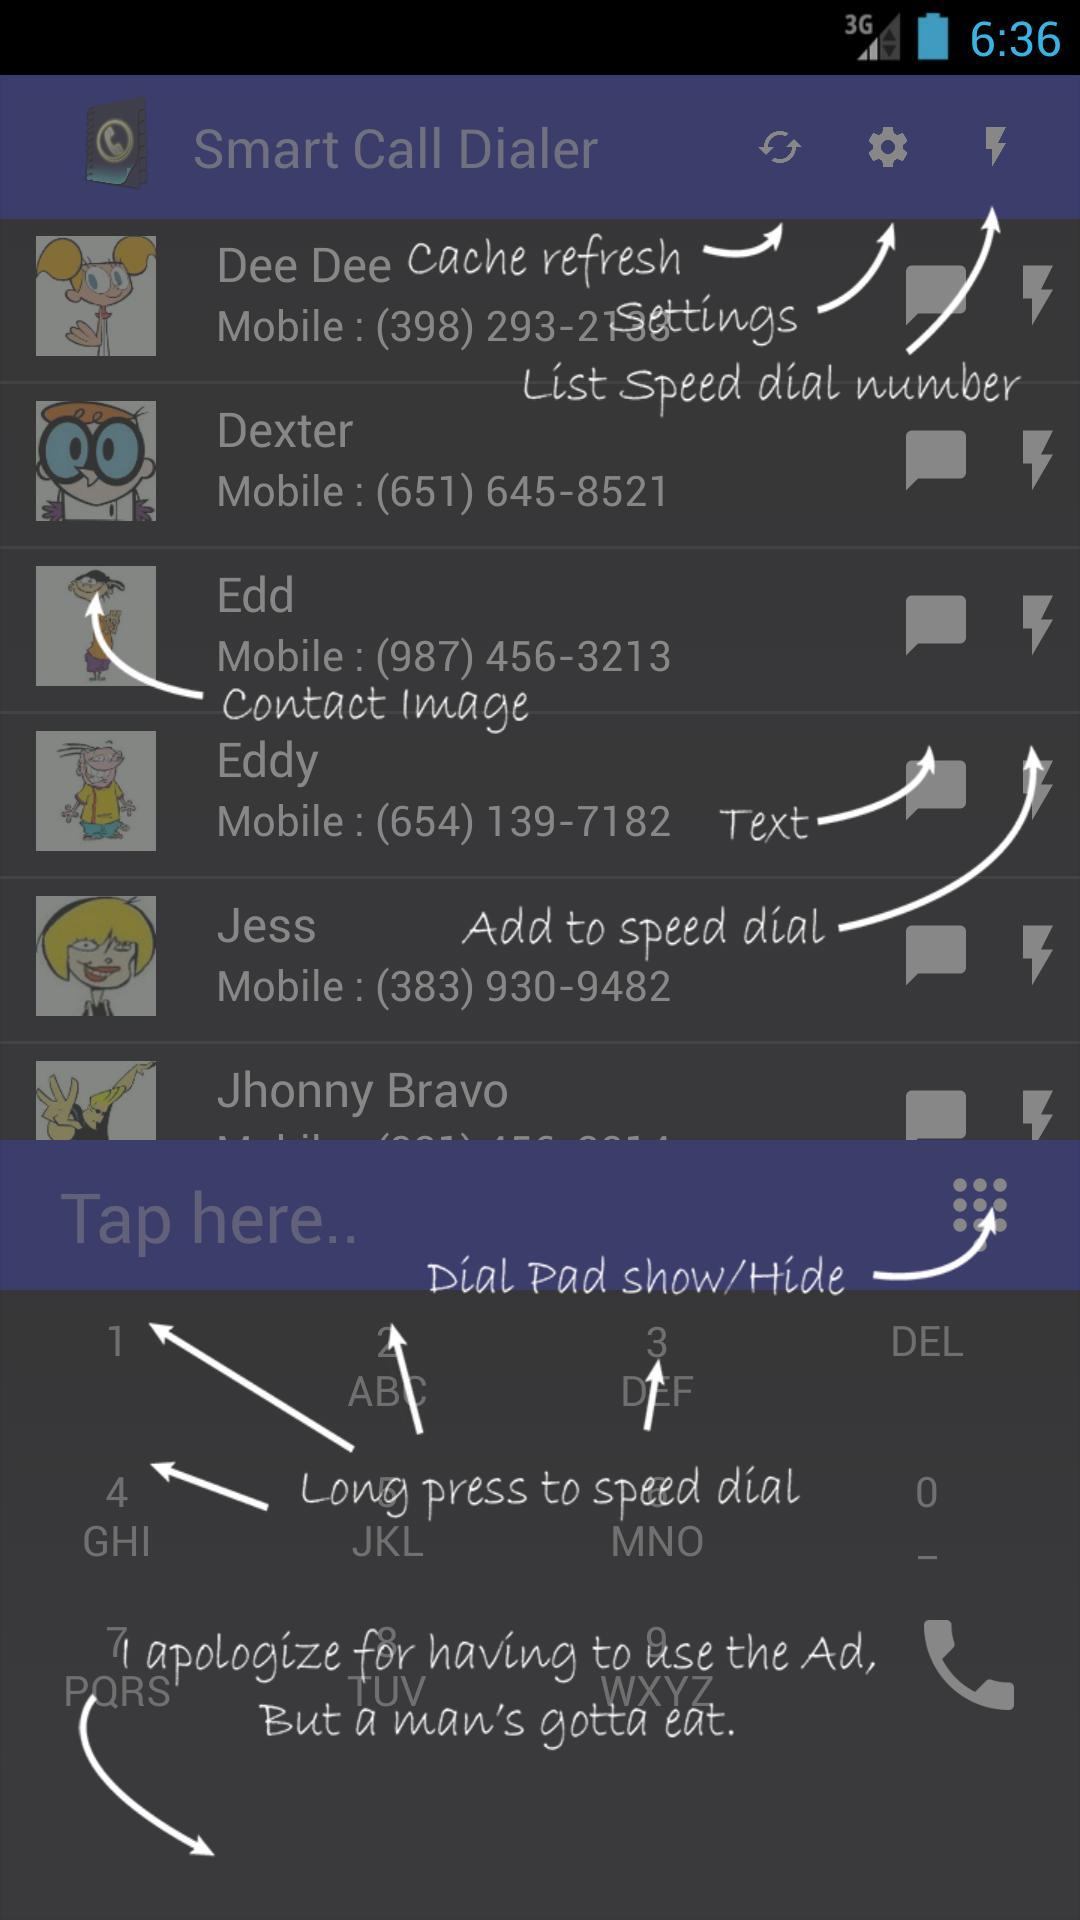 Smart Call Dialer screenshot 1